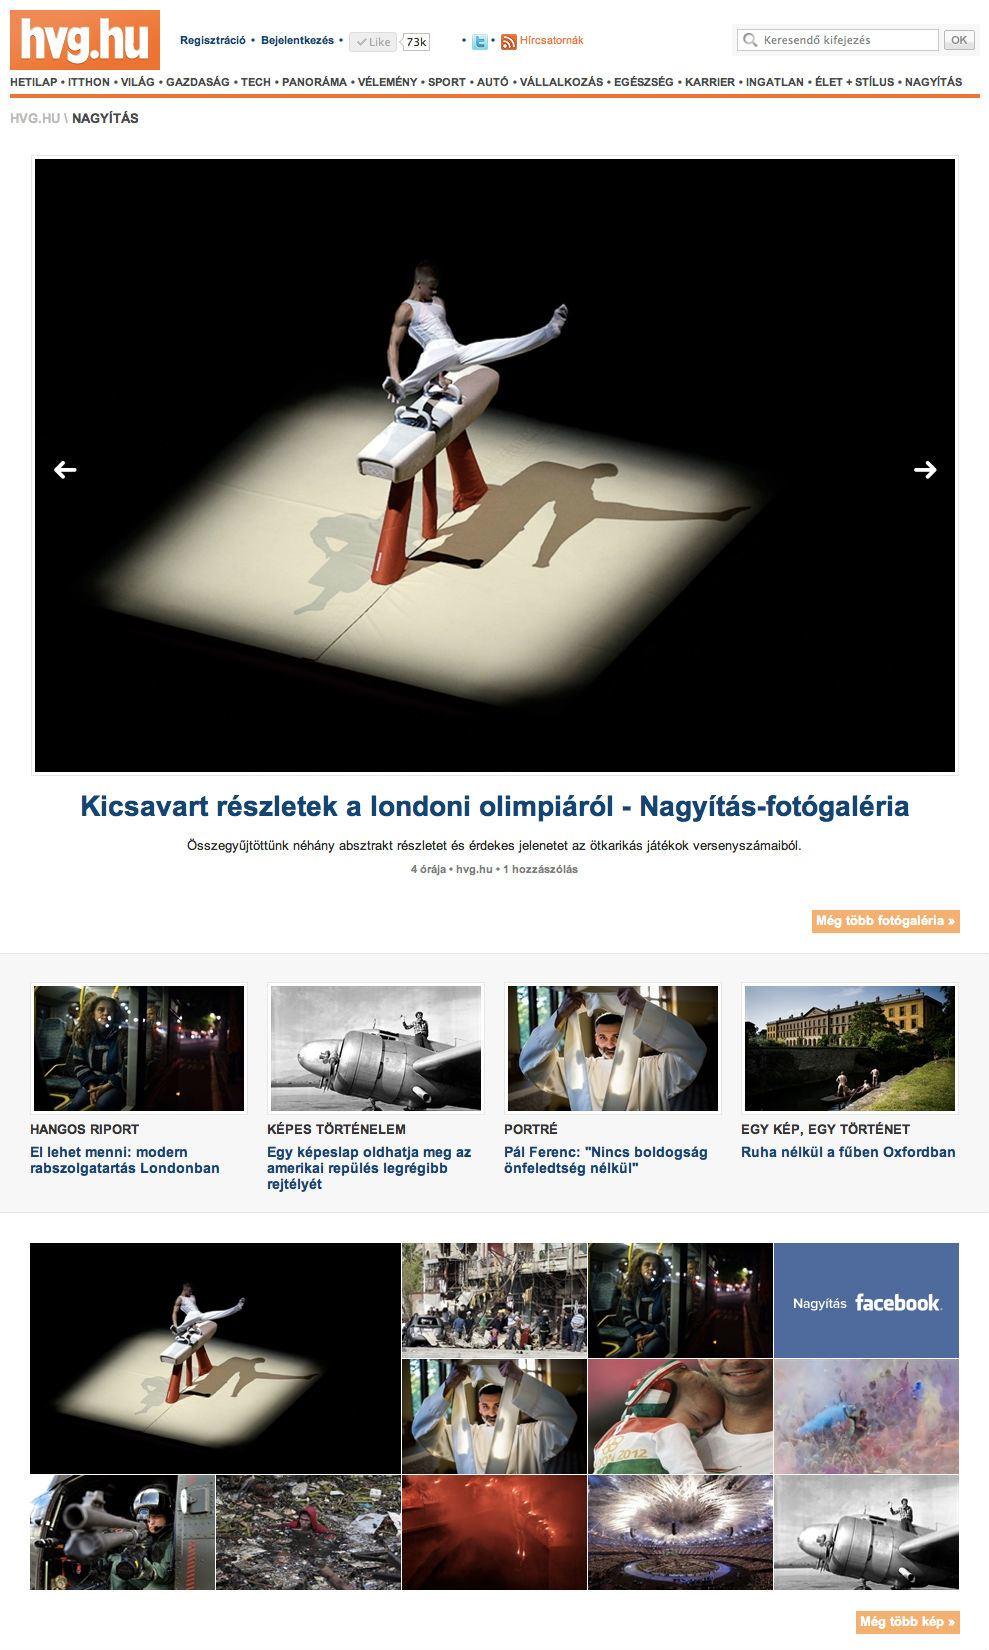 HVGnagyitas-newDesign